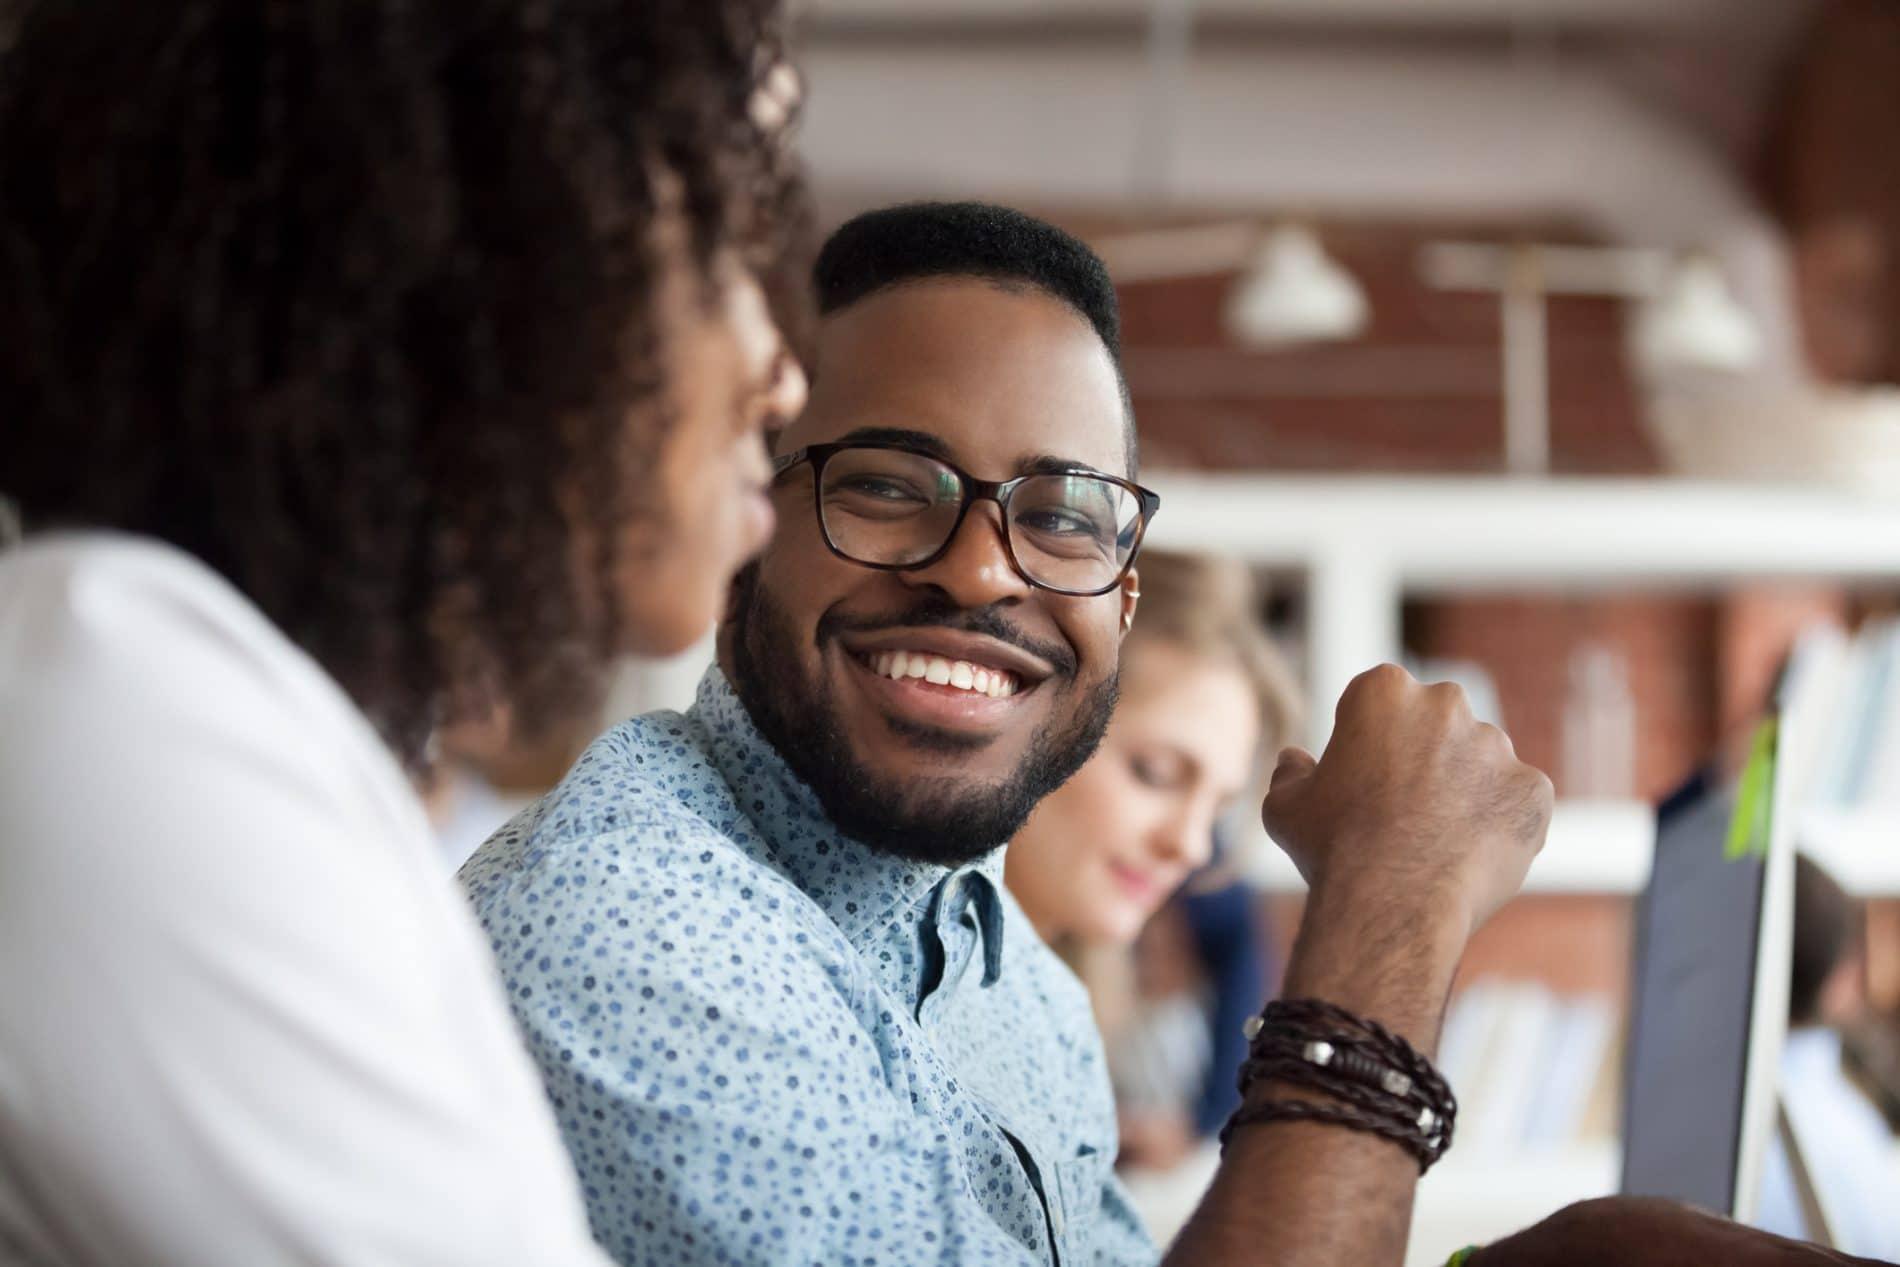 Employee embracing build back better